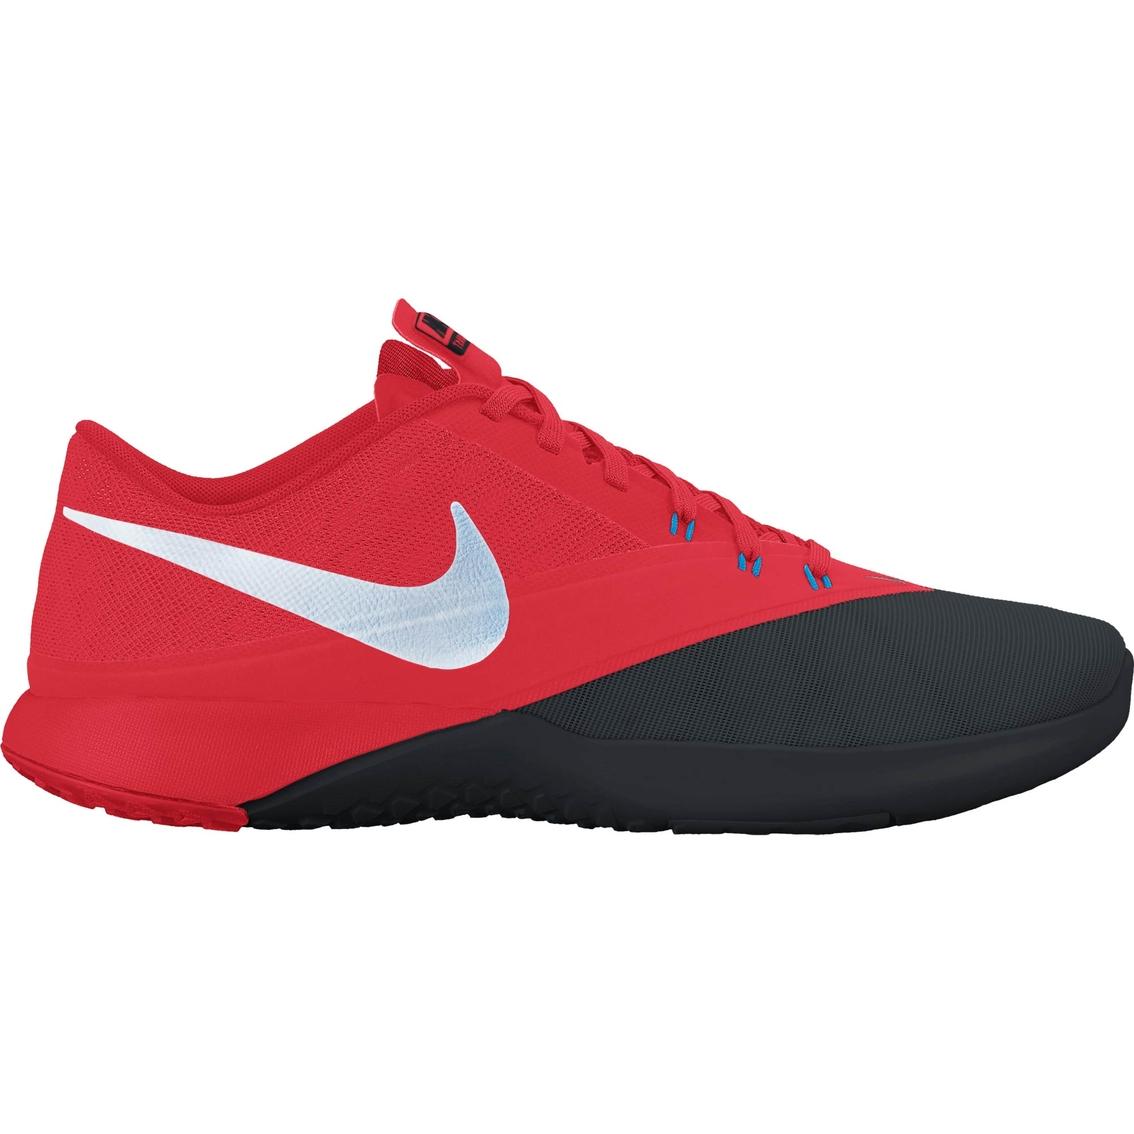 promo code 6a207 87c2c Nike Men s FS Lite Trainer 4 Training Shoes